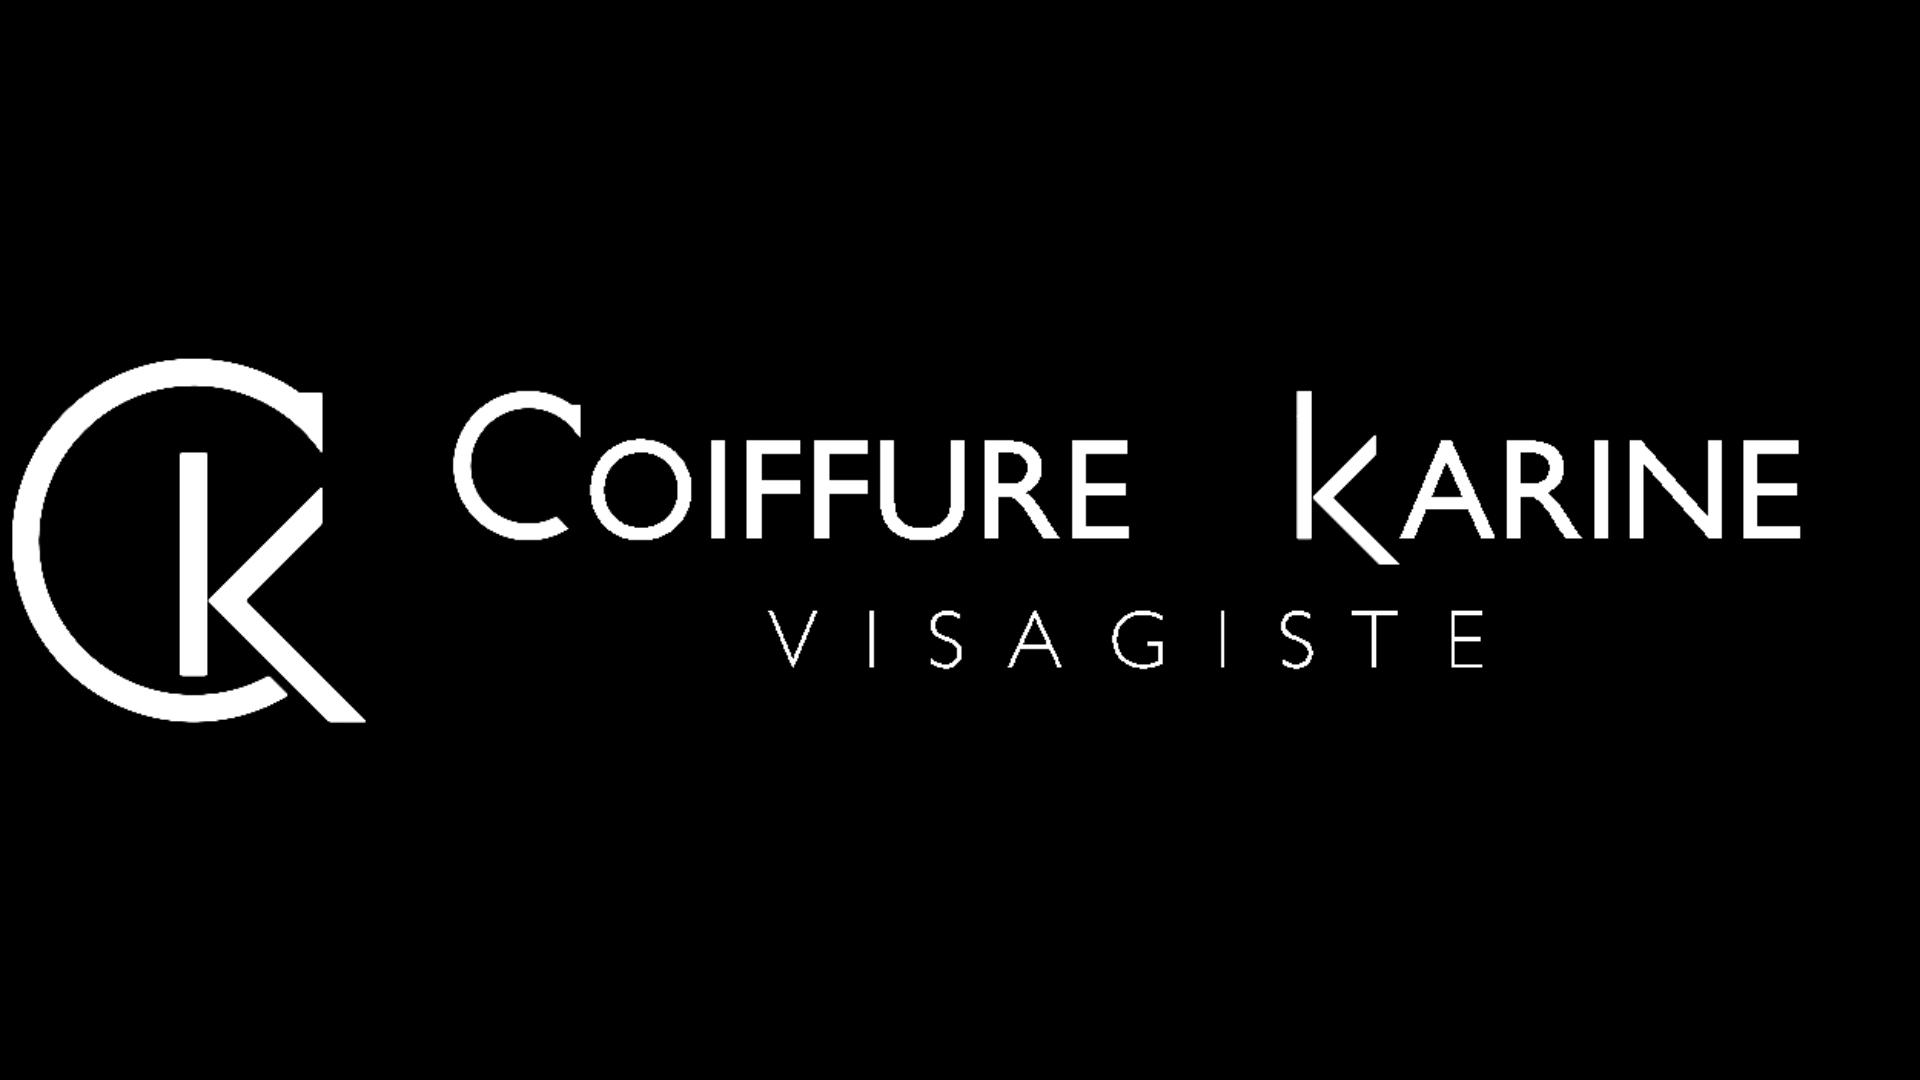 Coiffure Karine institut de beauté